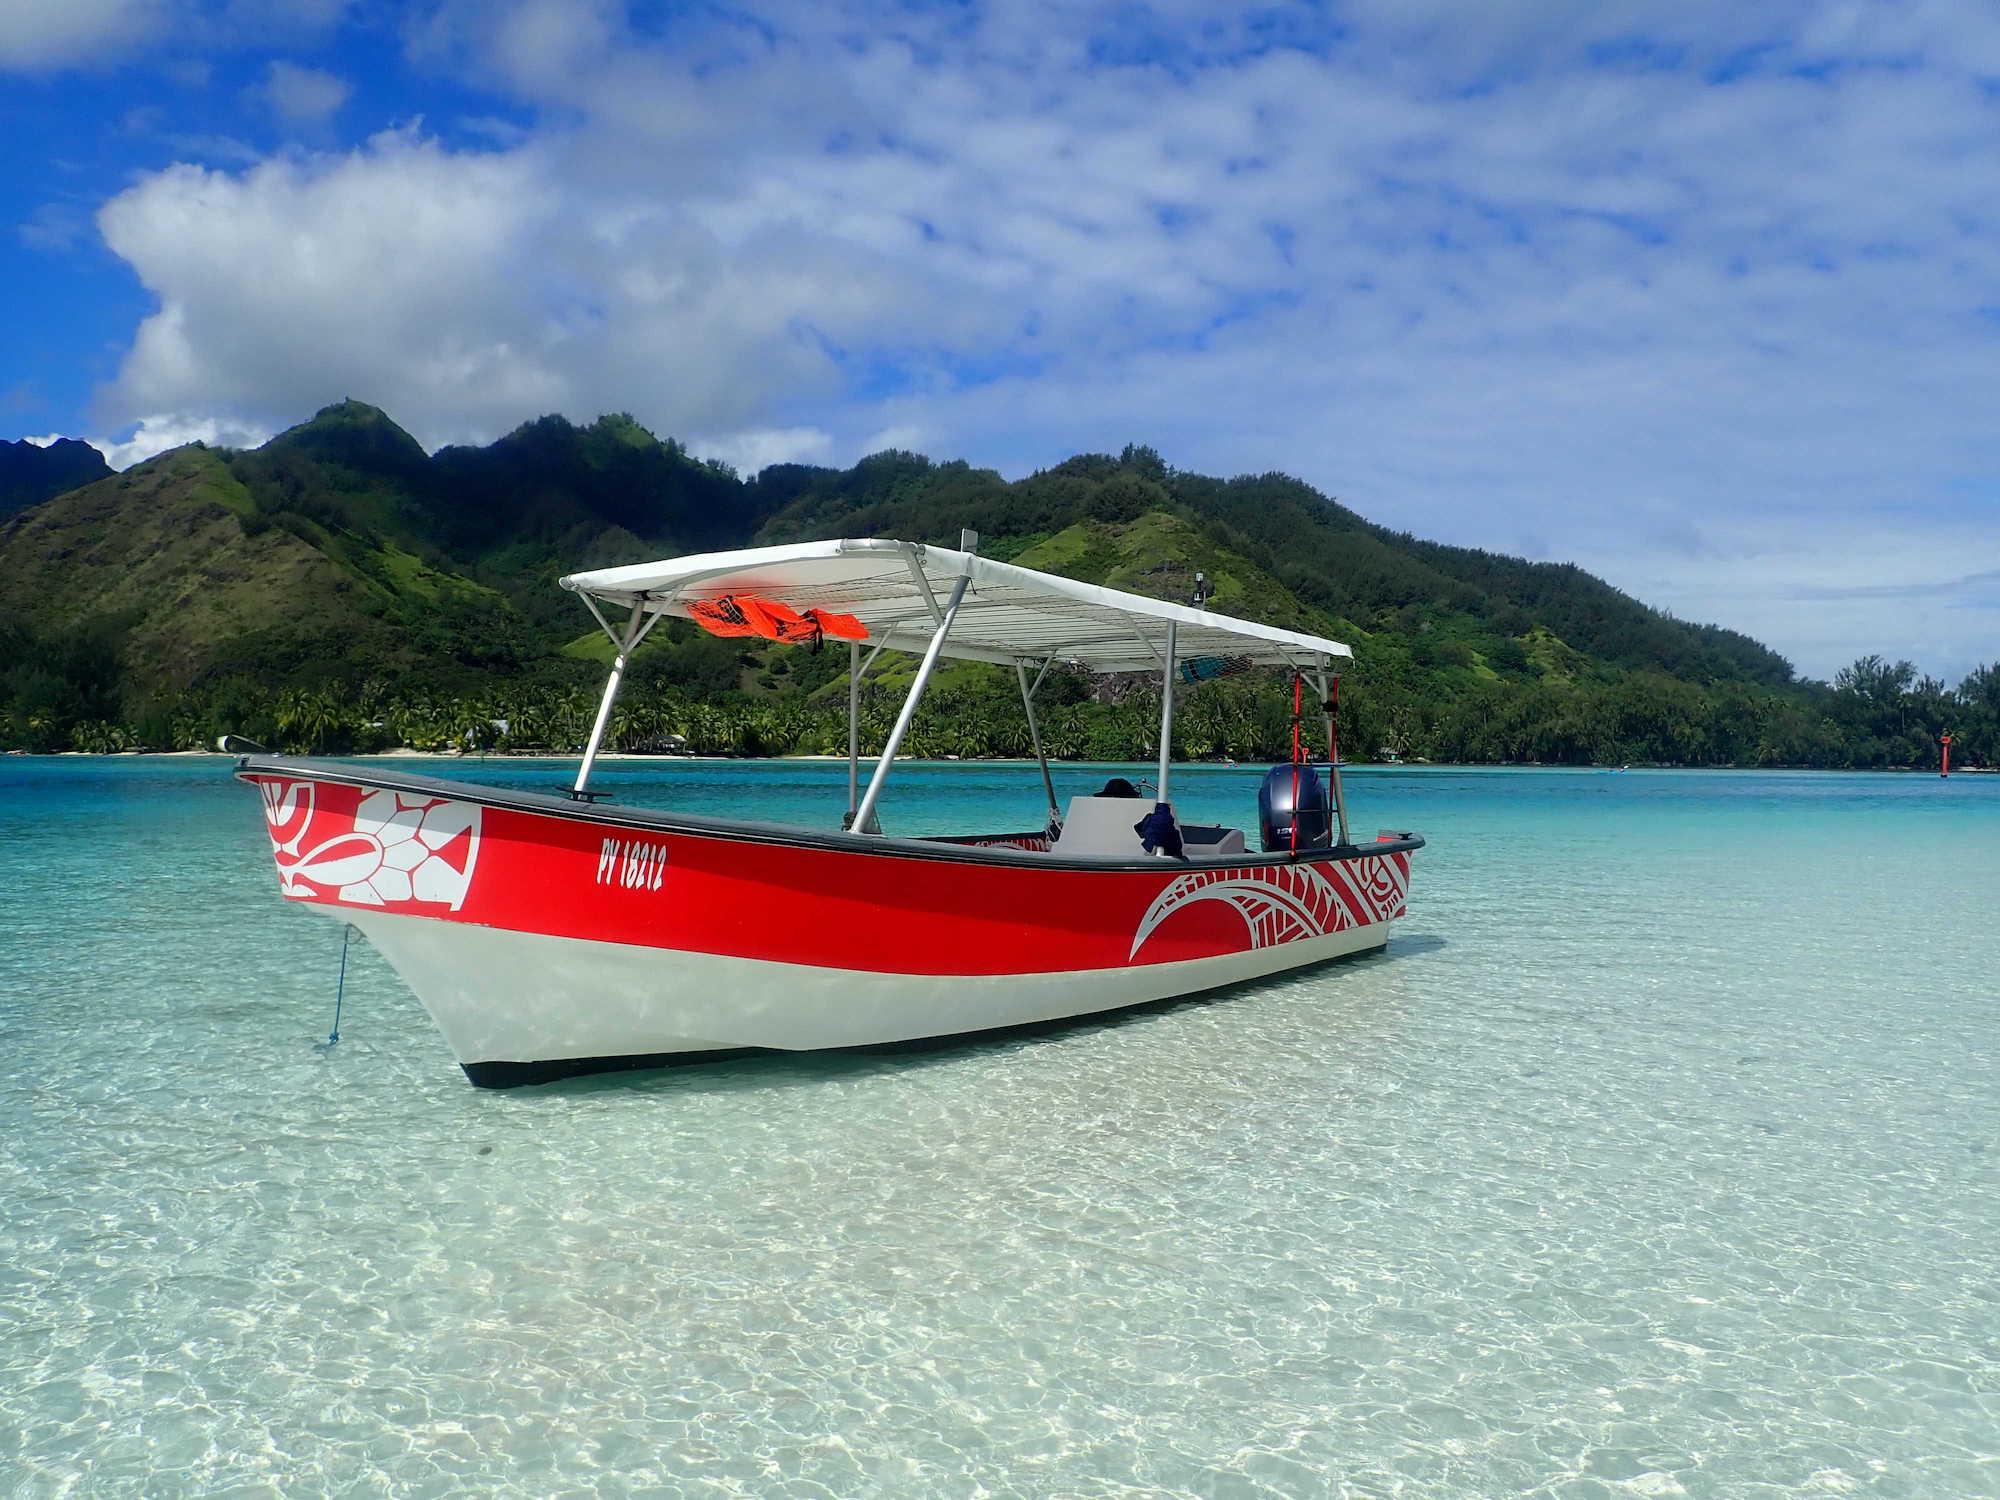 https://tahititourisme.cl/wp-content/uploads/2020/09/Boat-Hinaloa.jpg